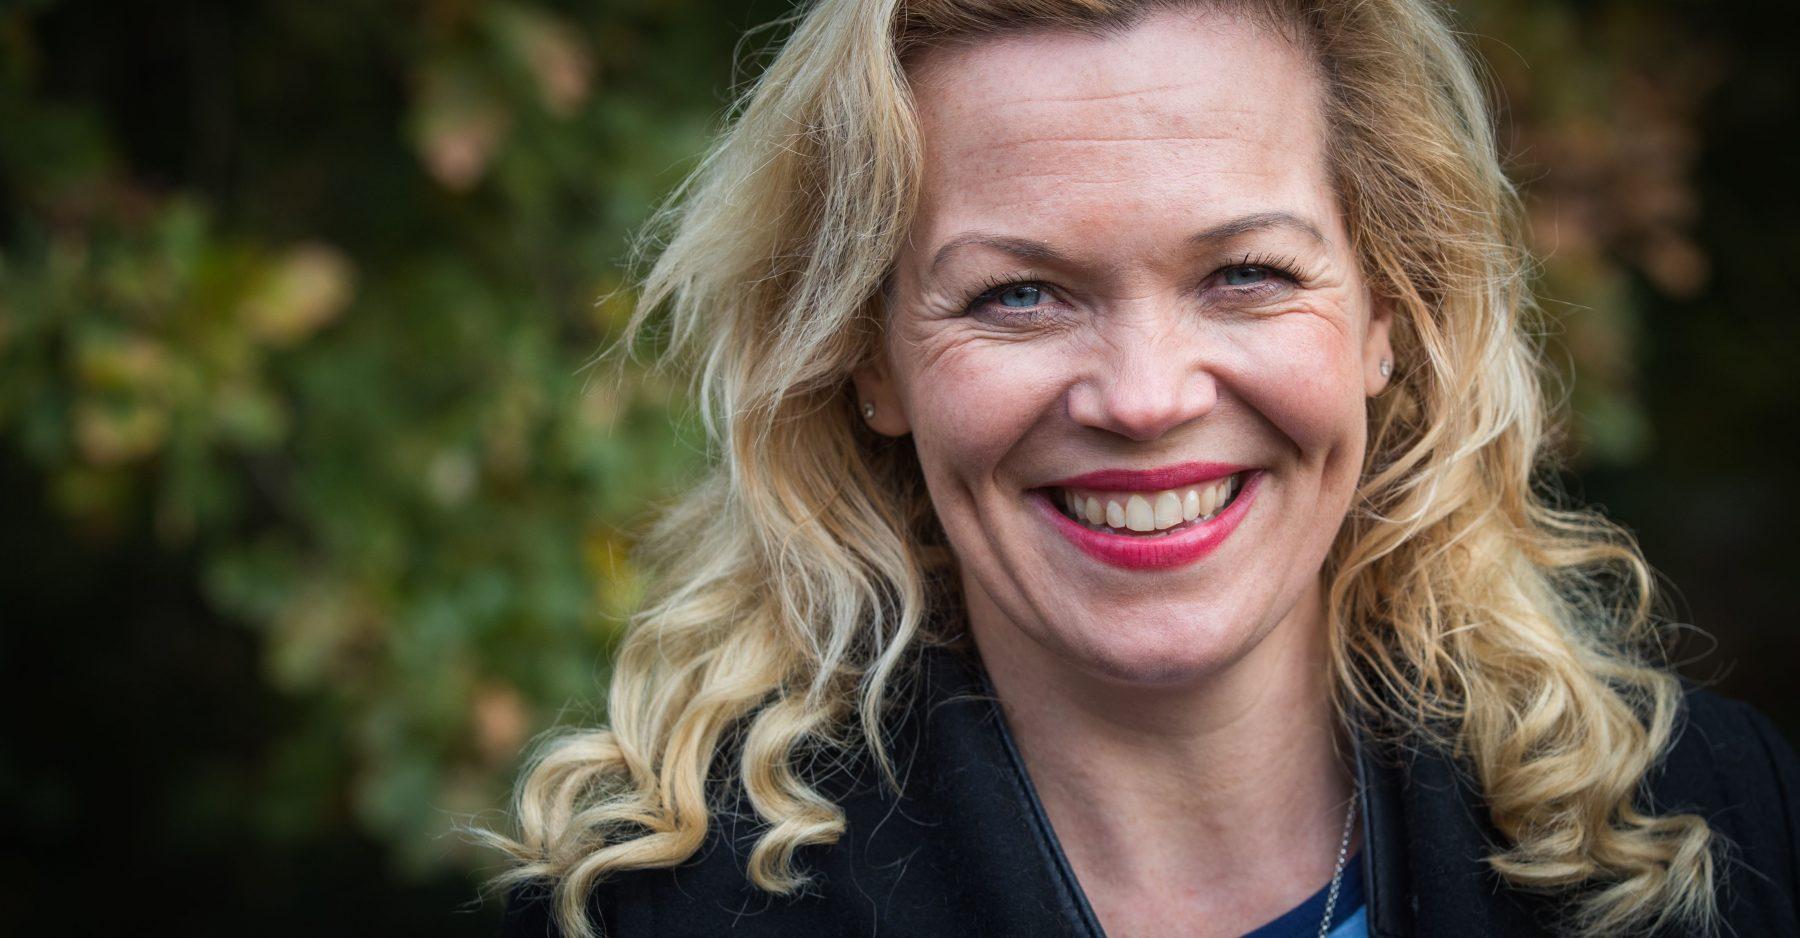 Rake column van Roos Schlikker: 'Wanneer gaan ouders een grens over?'